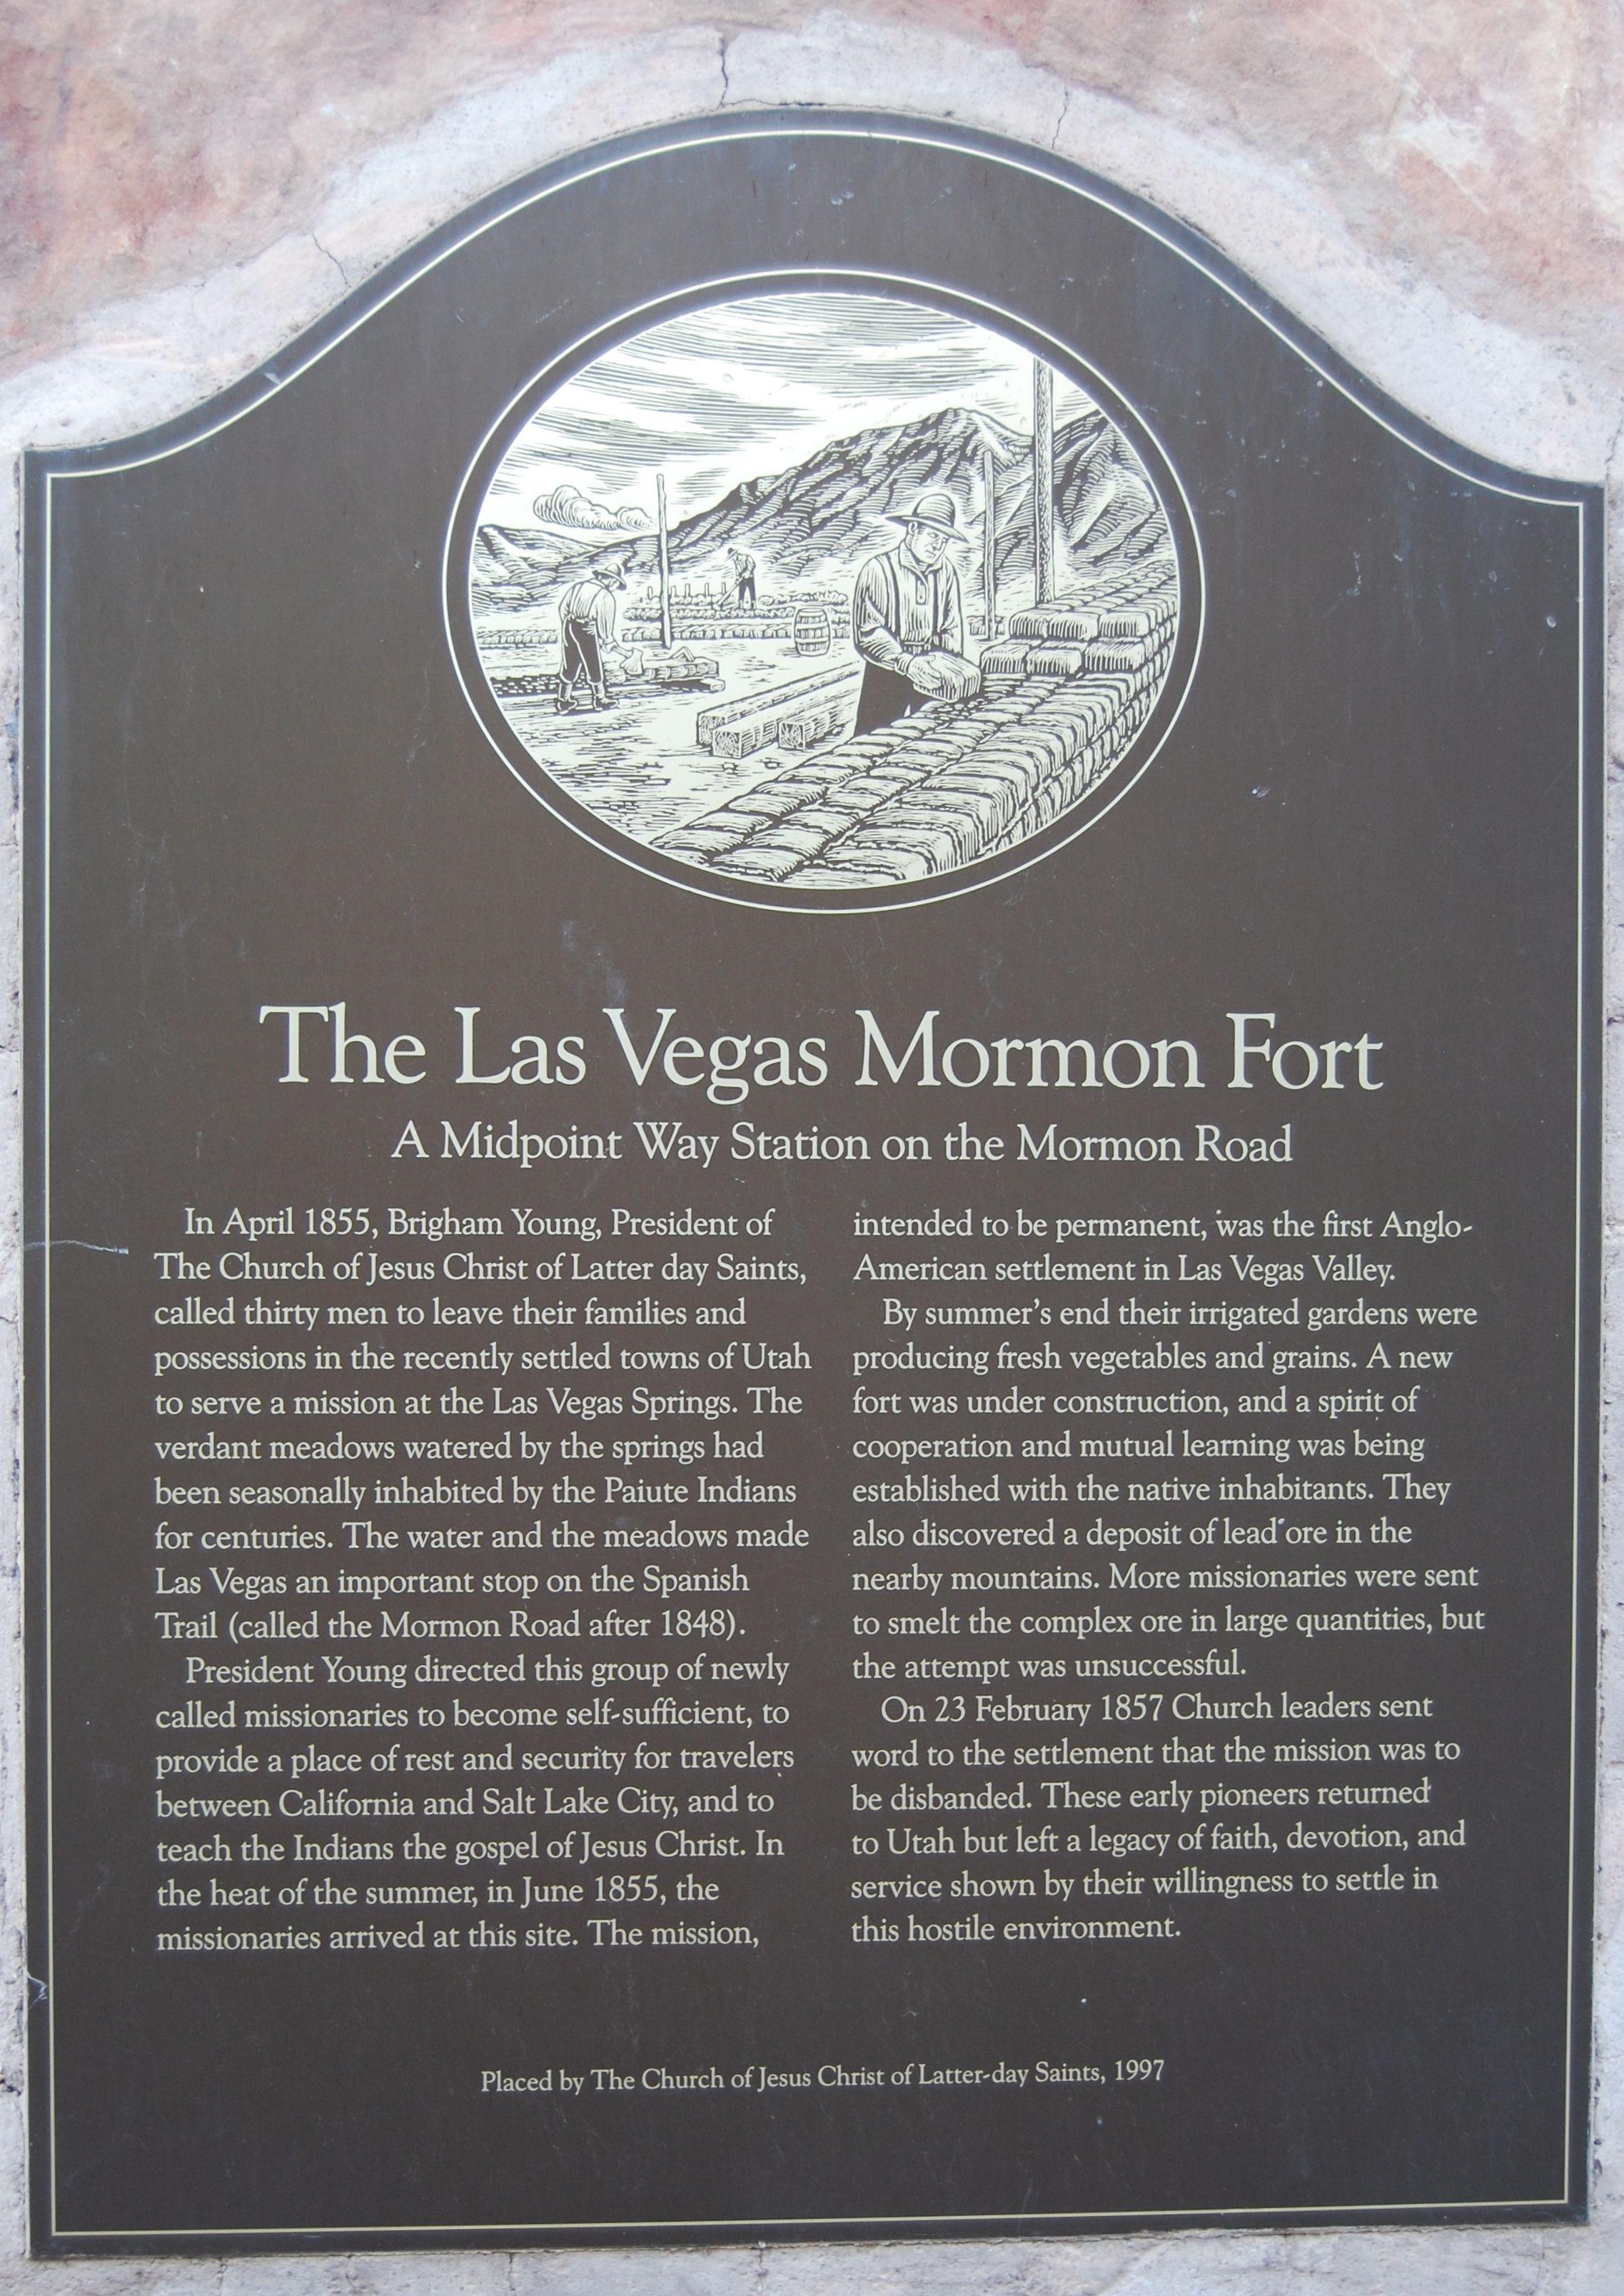 The Las Vegas Mormon Fort Marker